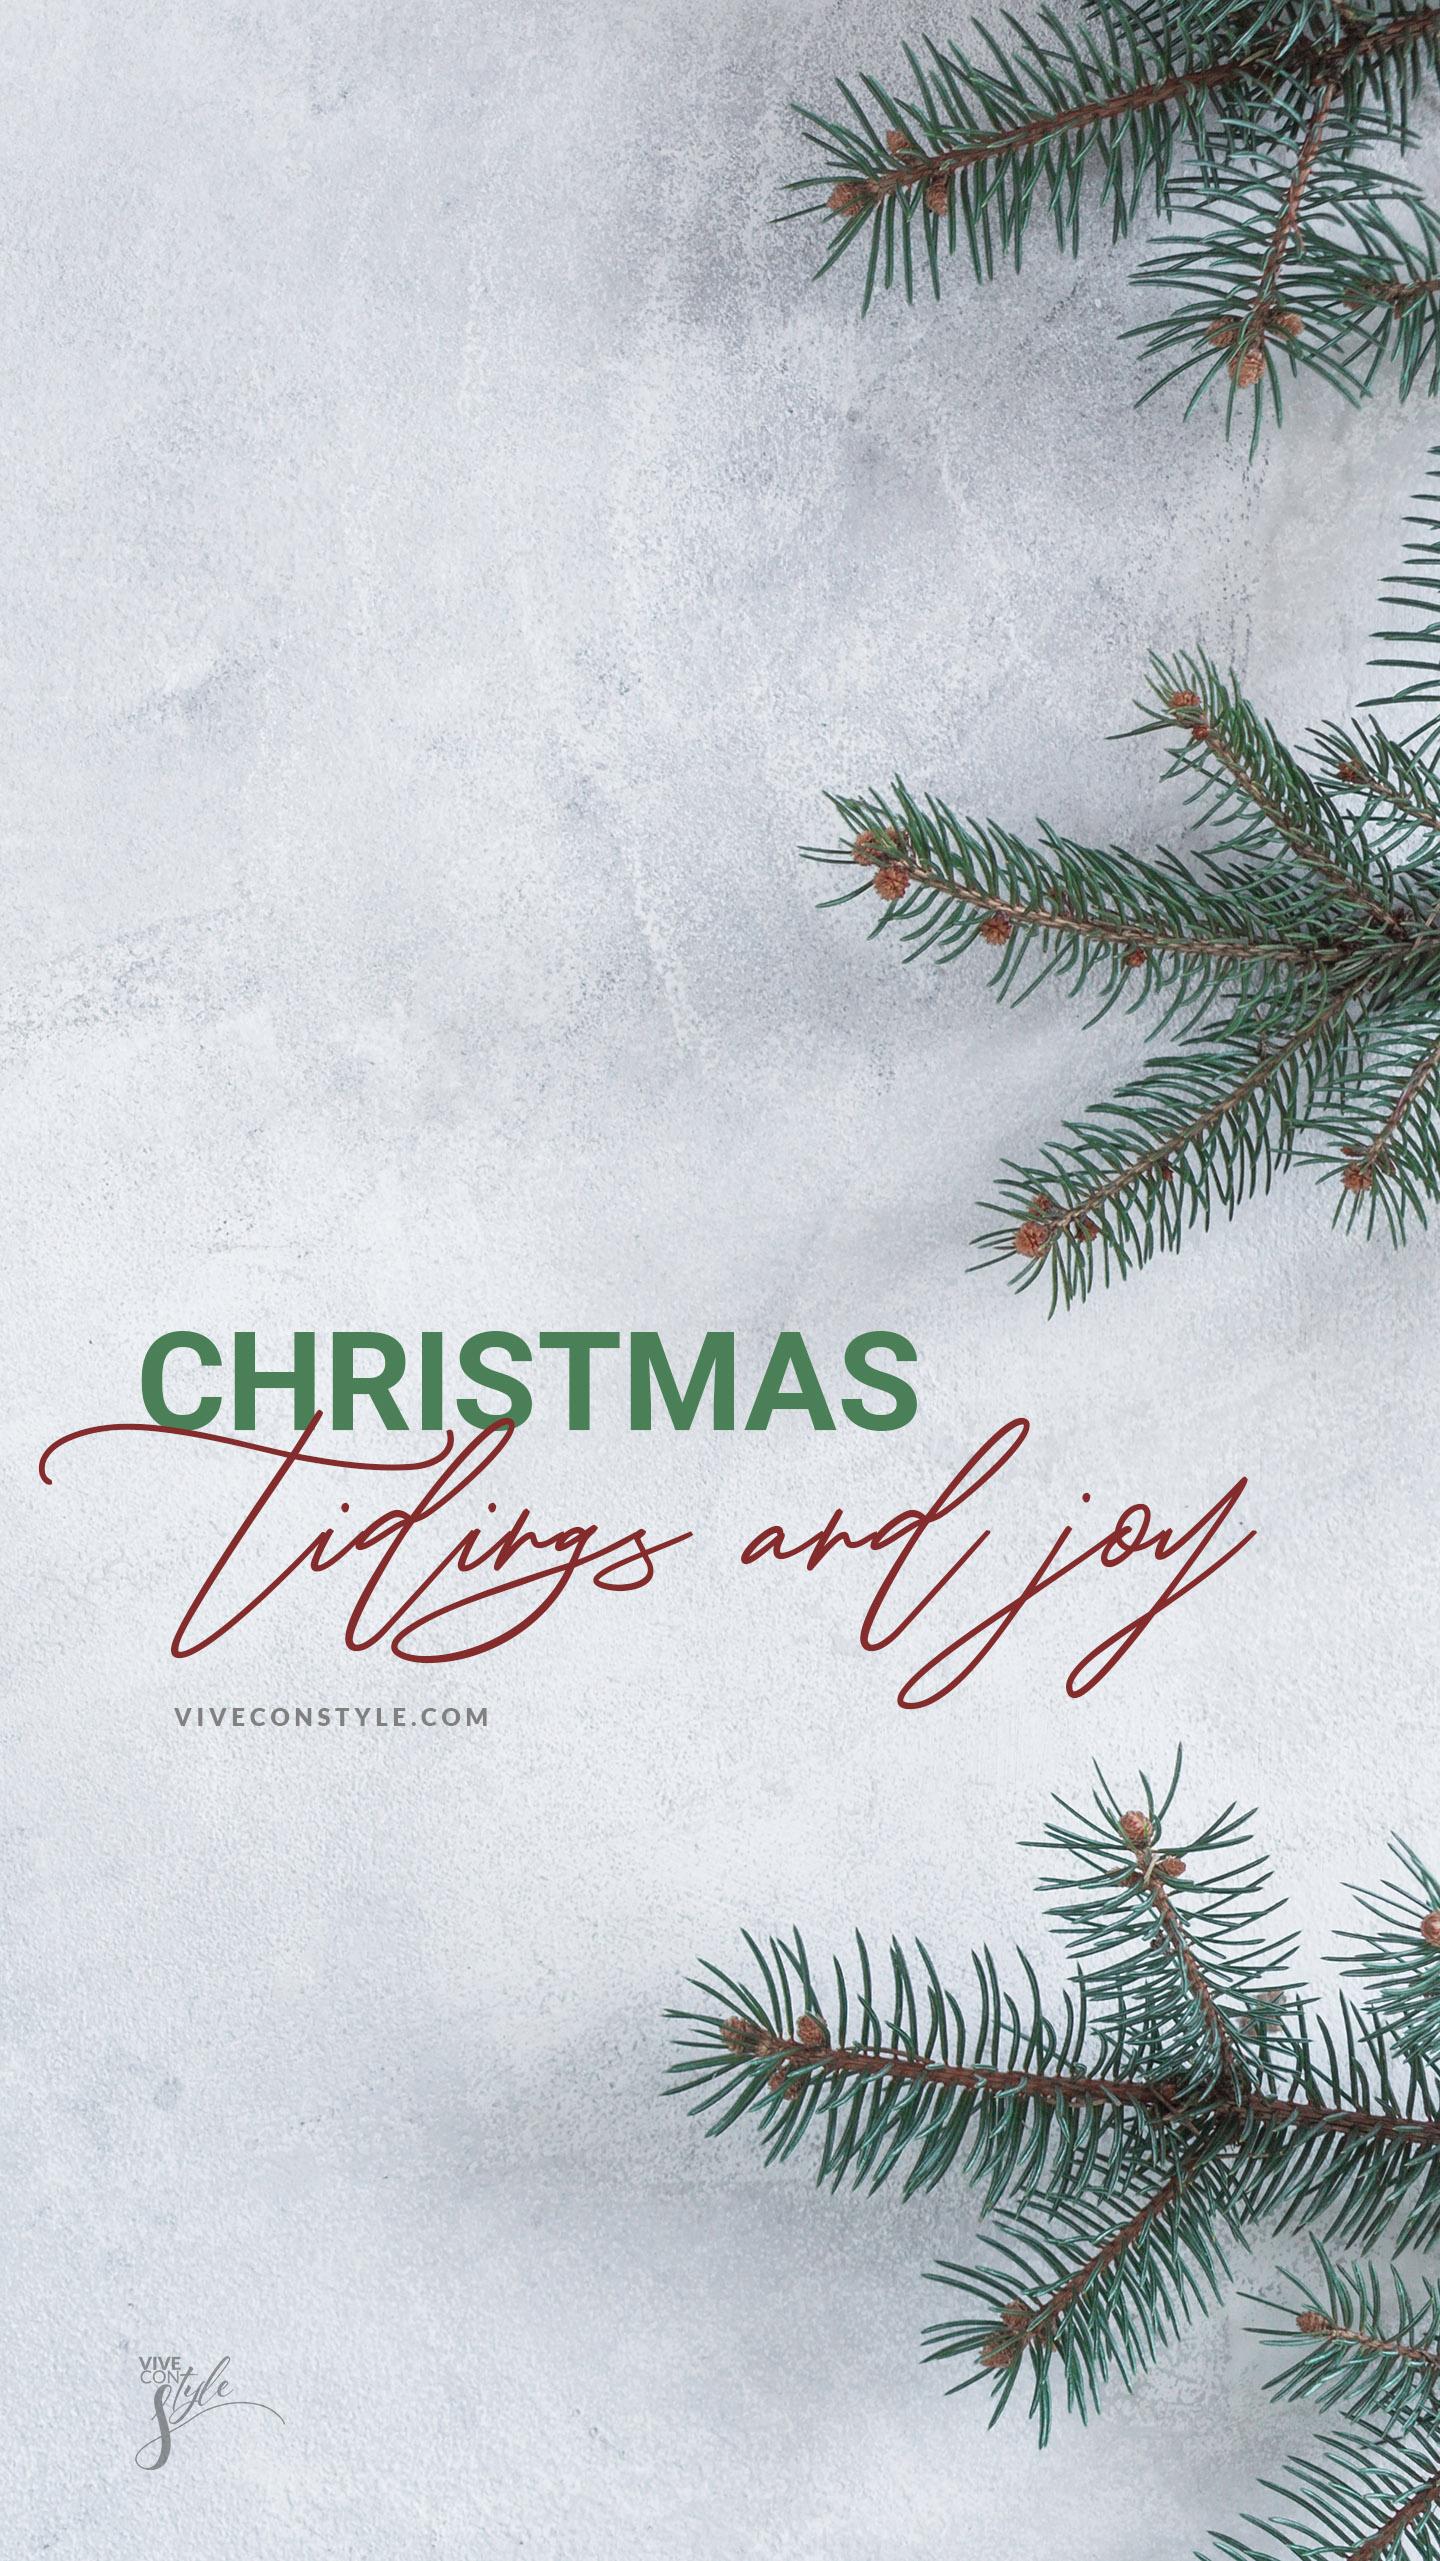 Christmas tidings and joy wallpaper